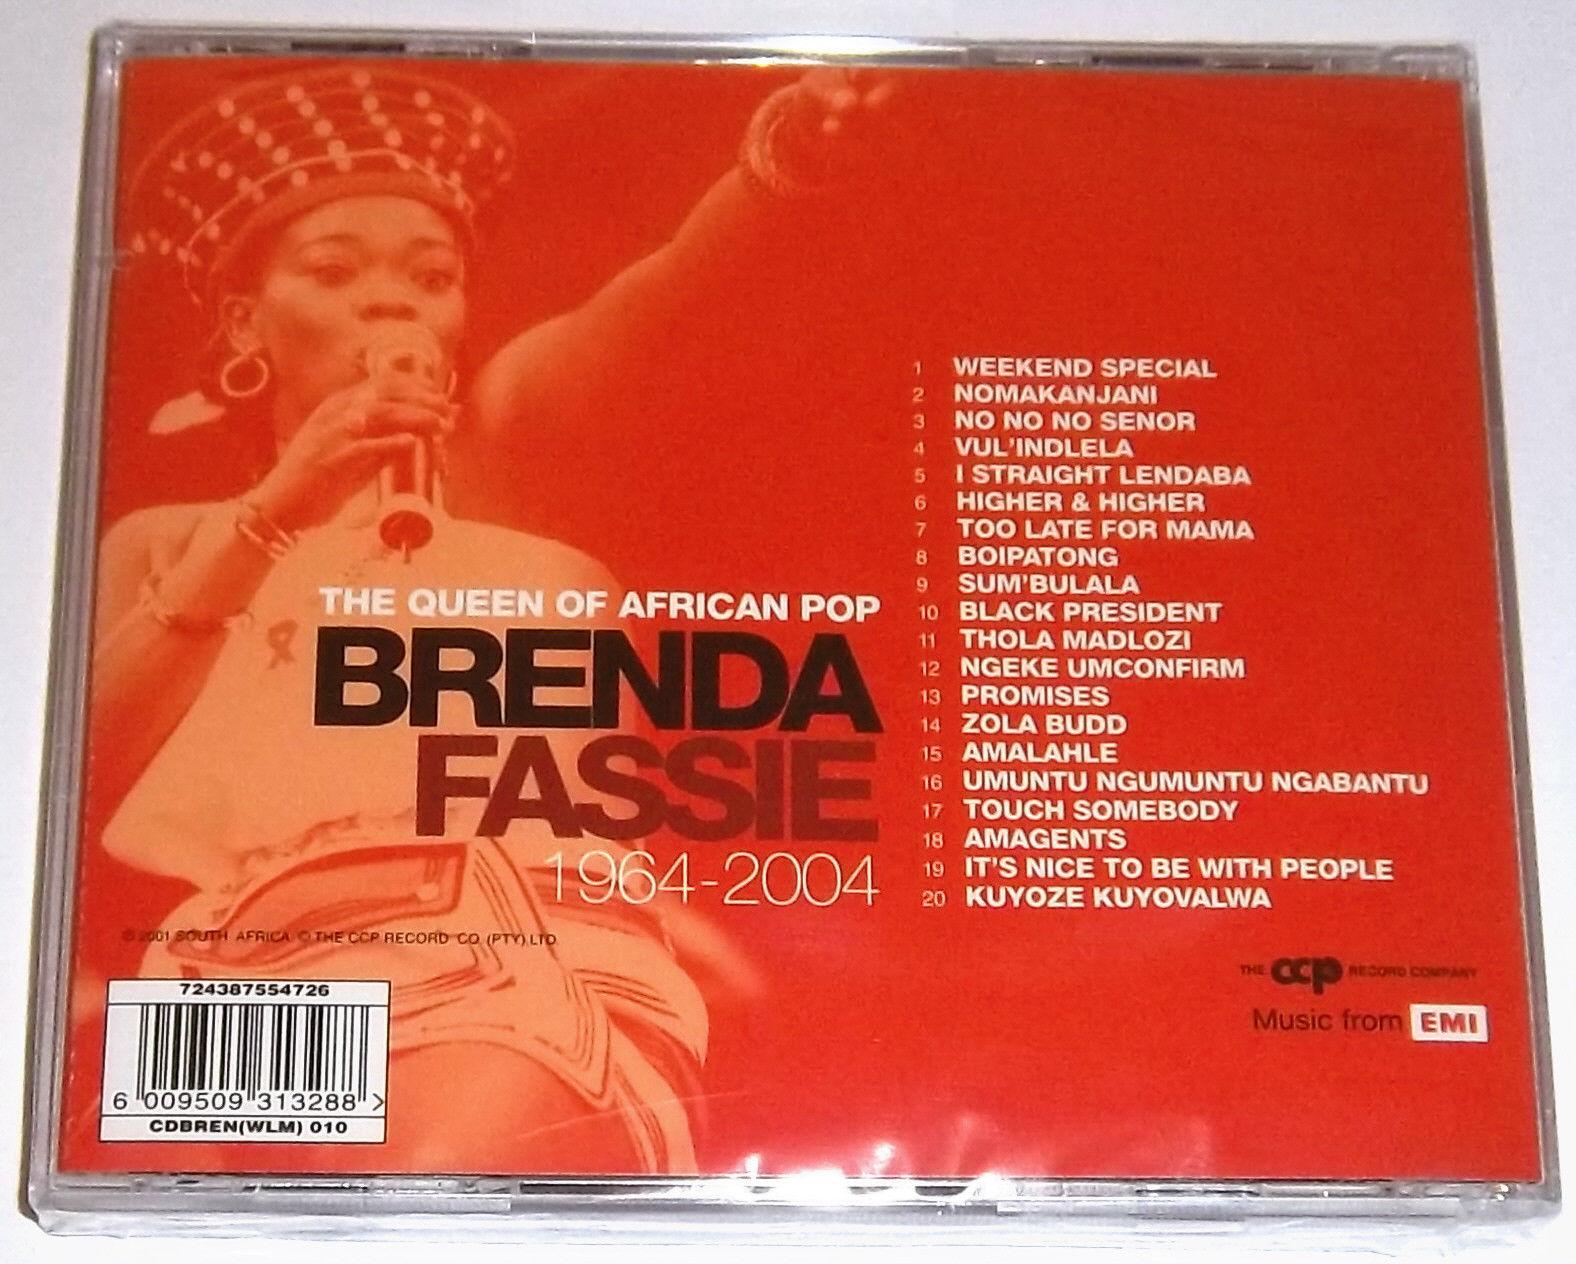 BRENDA FASSIE Greatest Hits 1964-2004 SOUTH AFRICA Cat# CDBREN010